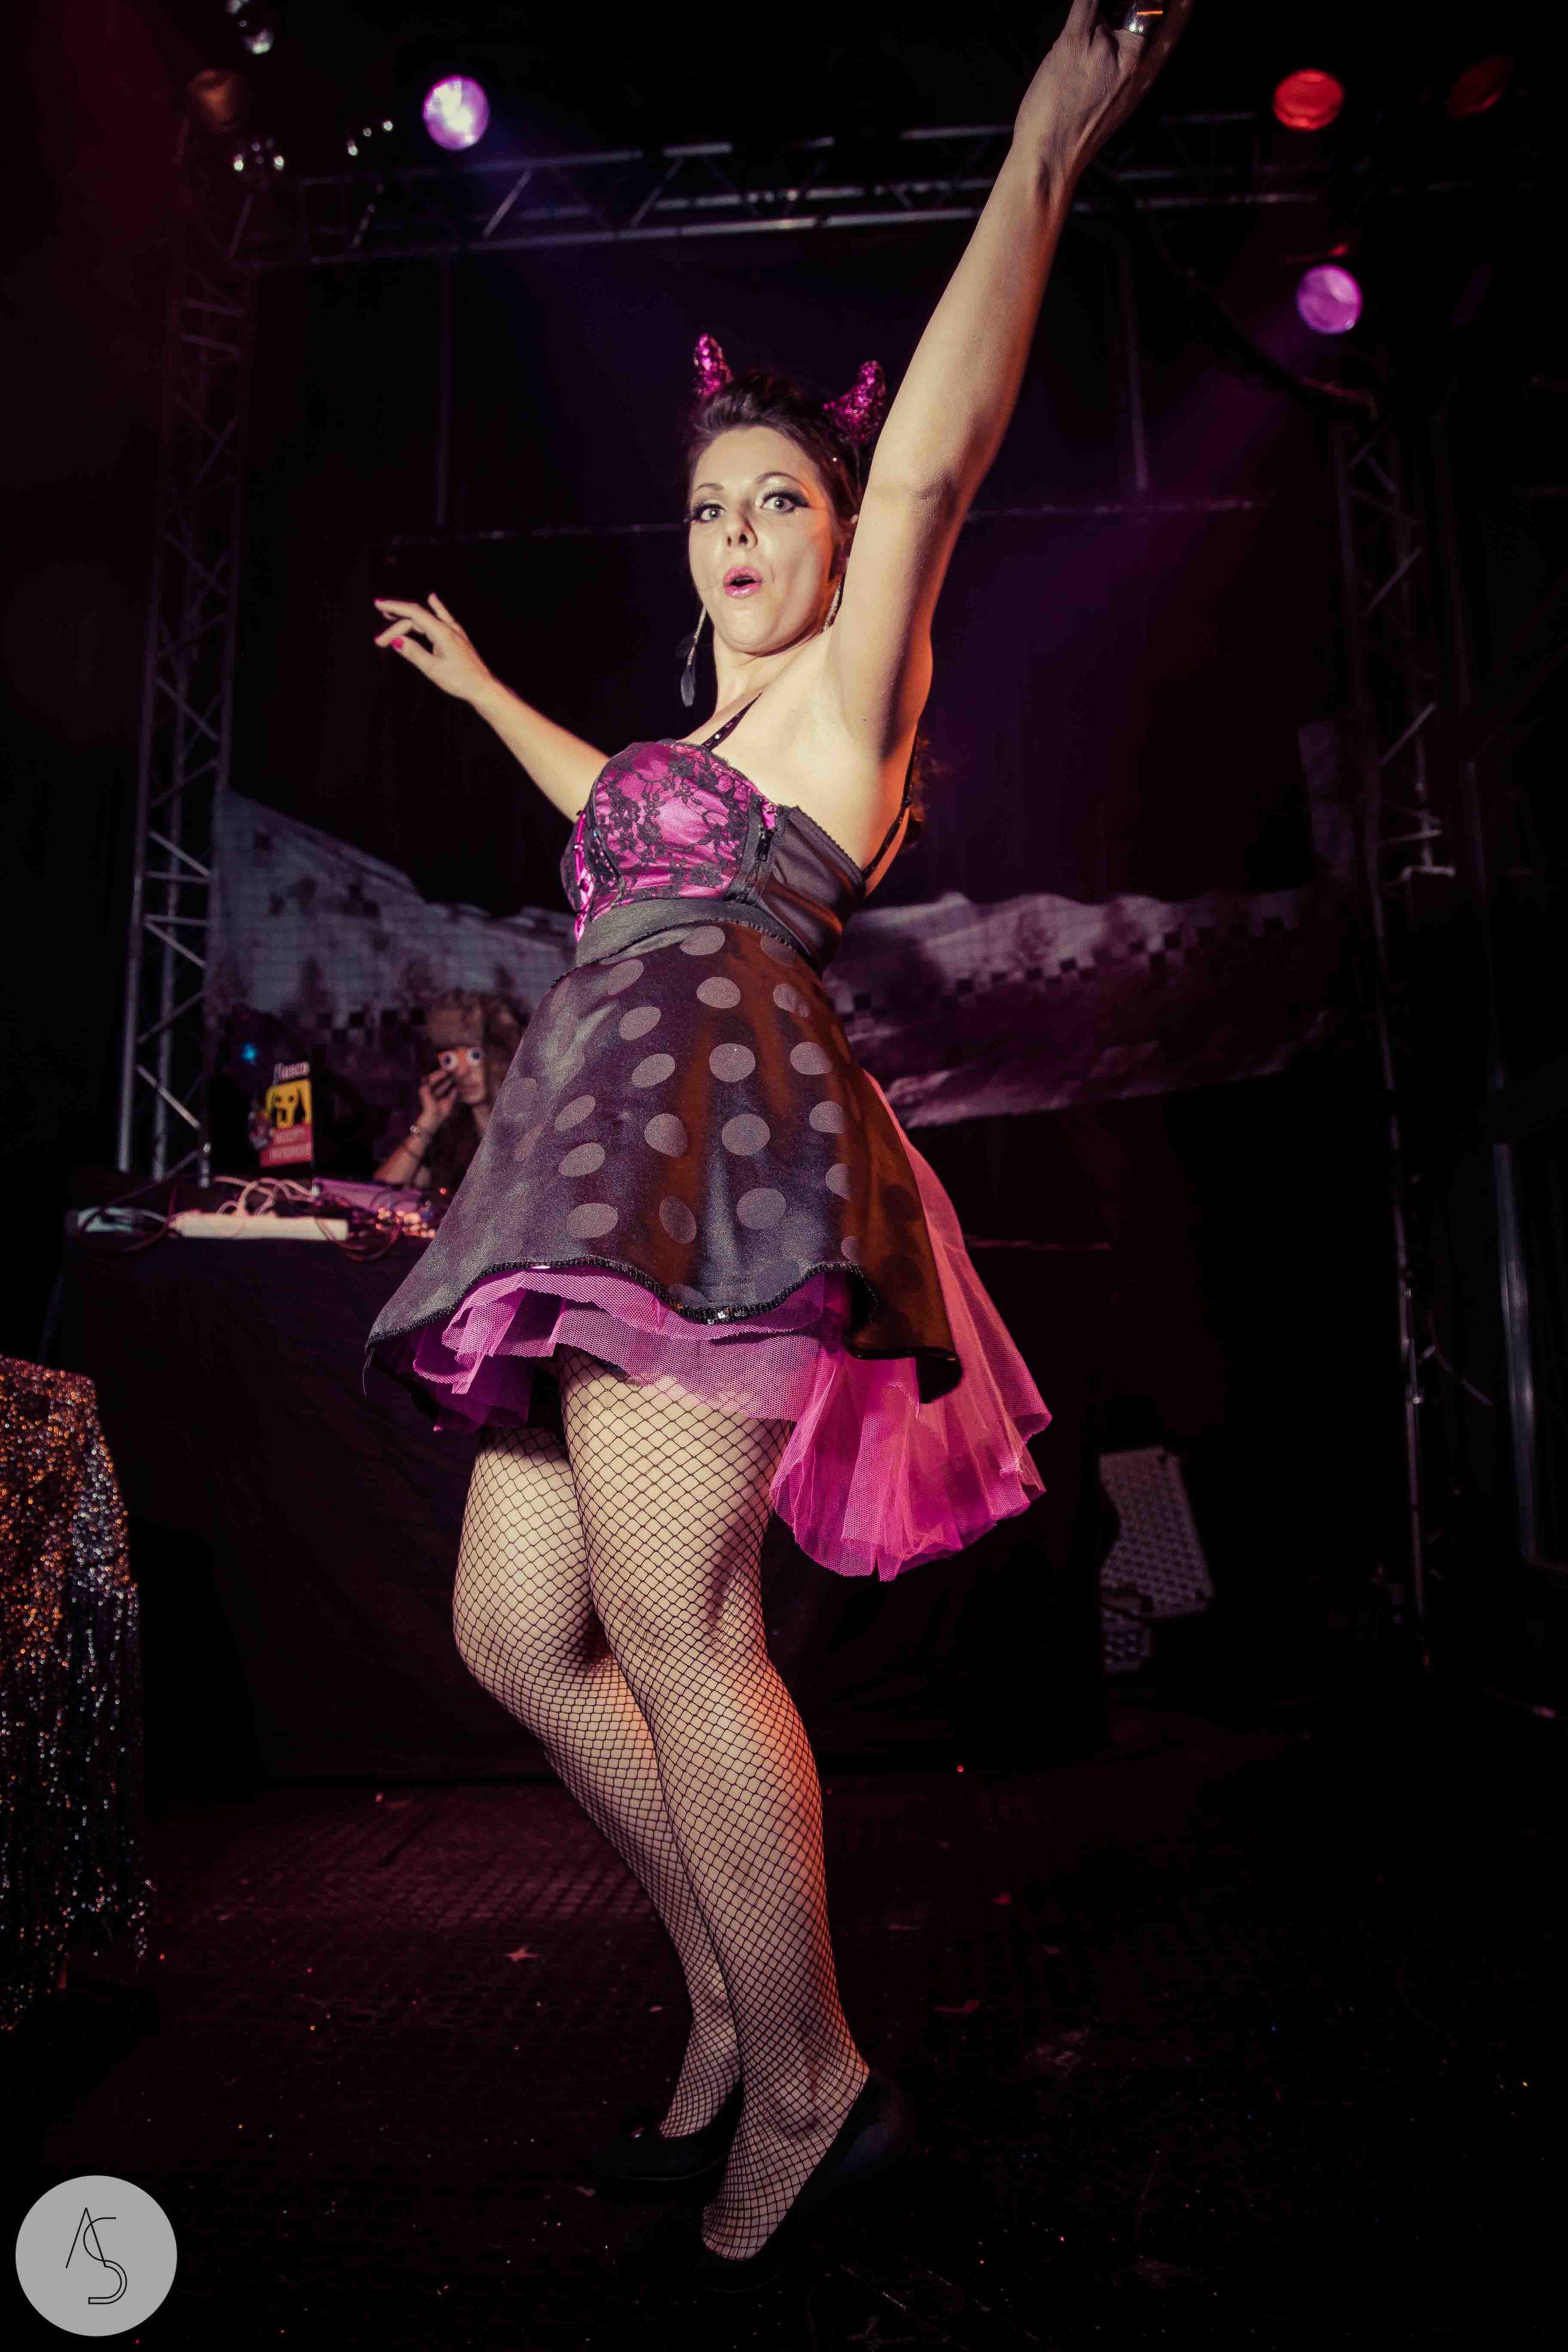 Electro swing cabaret - Ninkasi- photographe evenements - Adriana Salazar photo-181.jpg